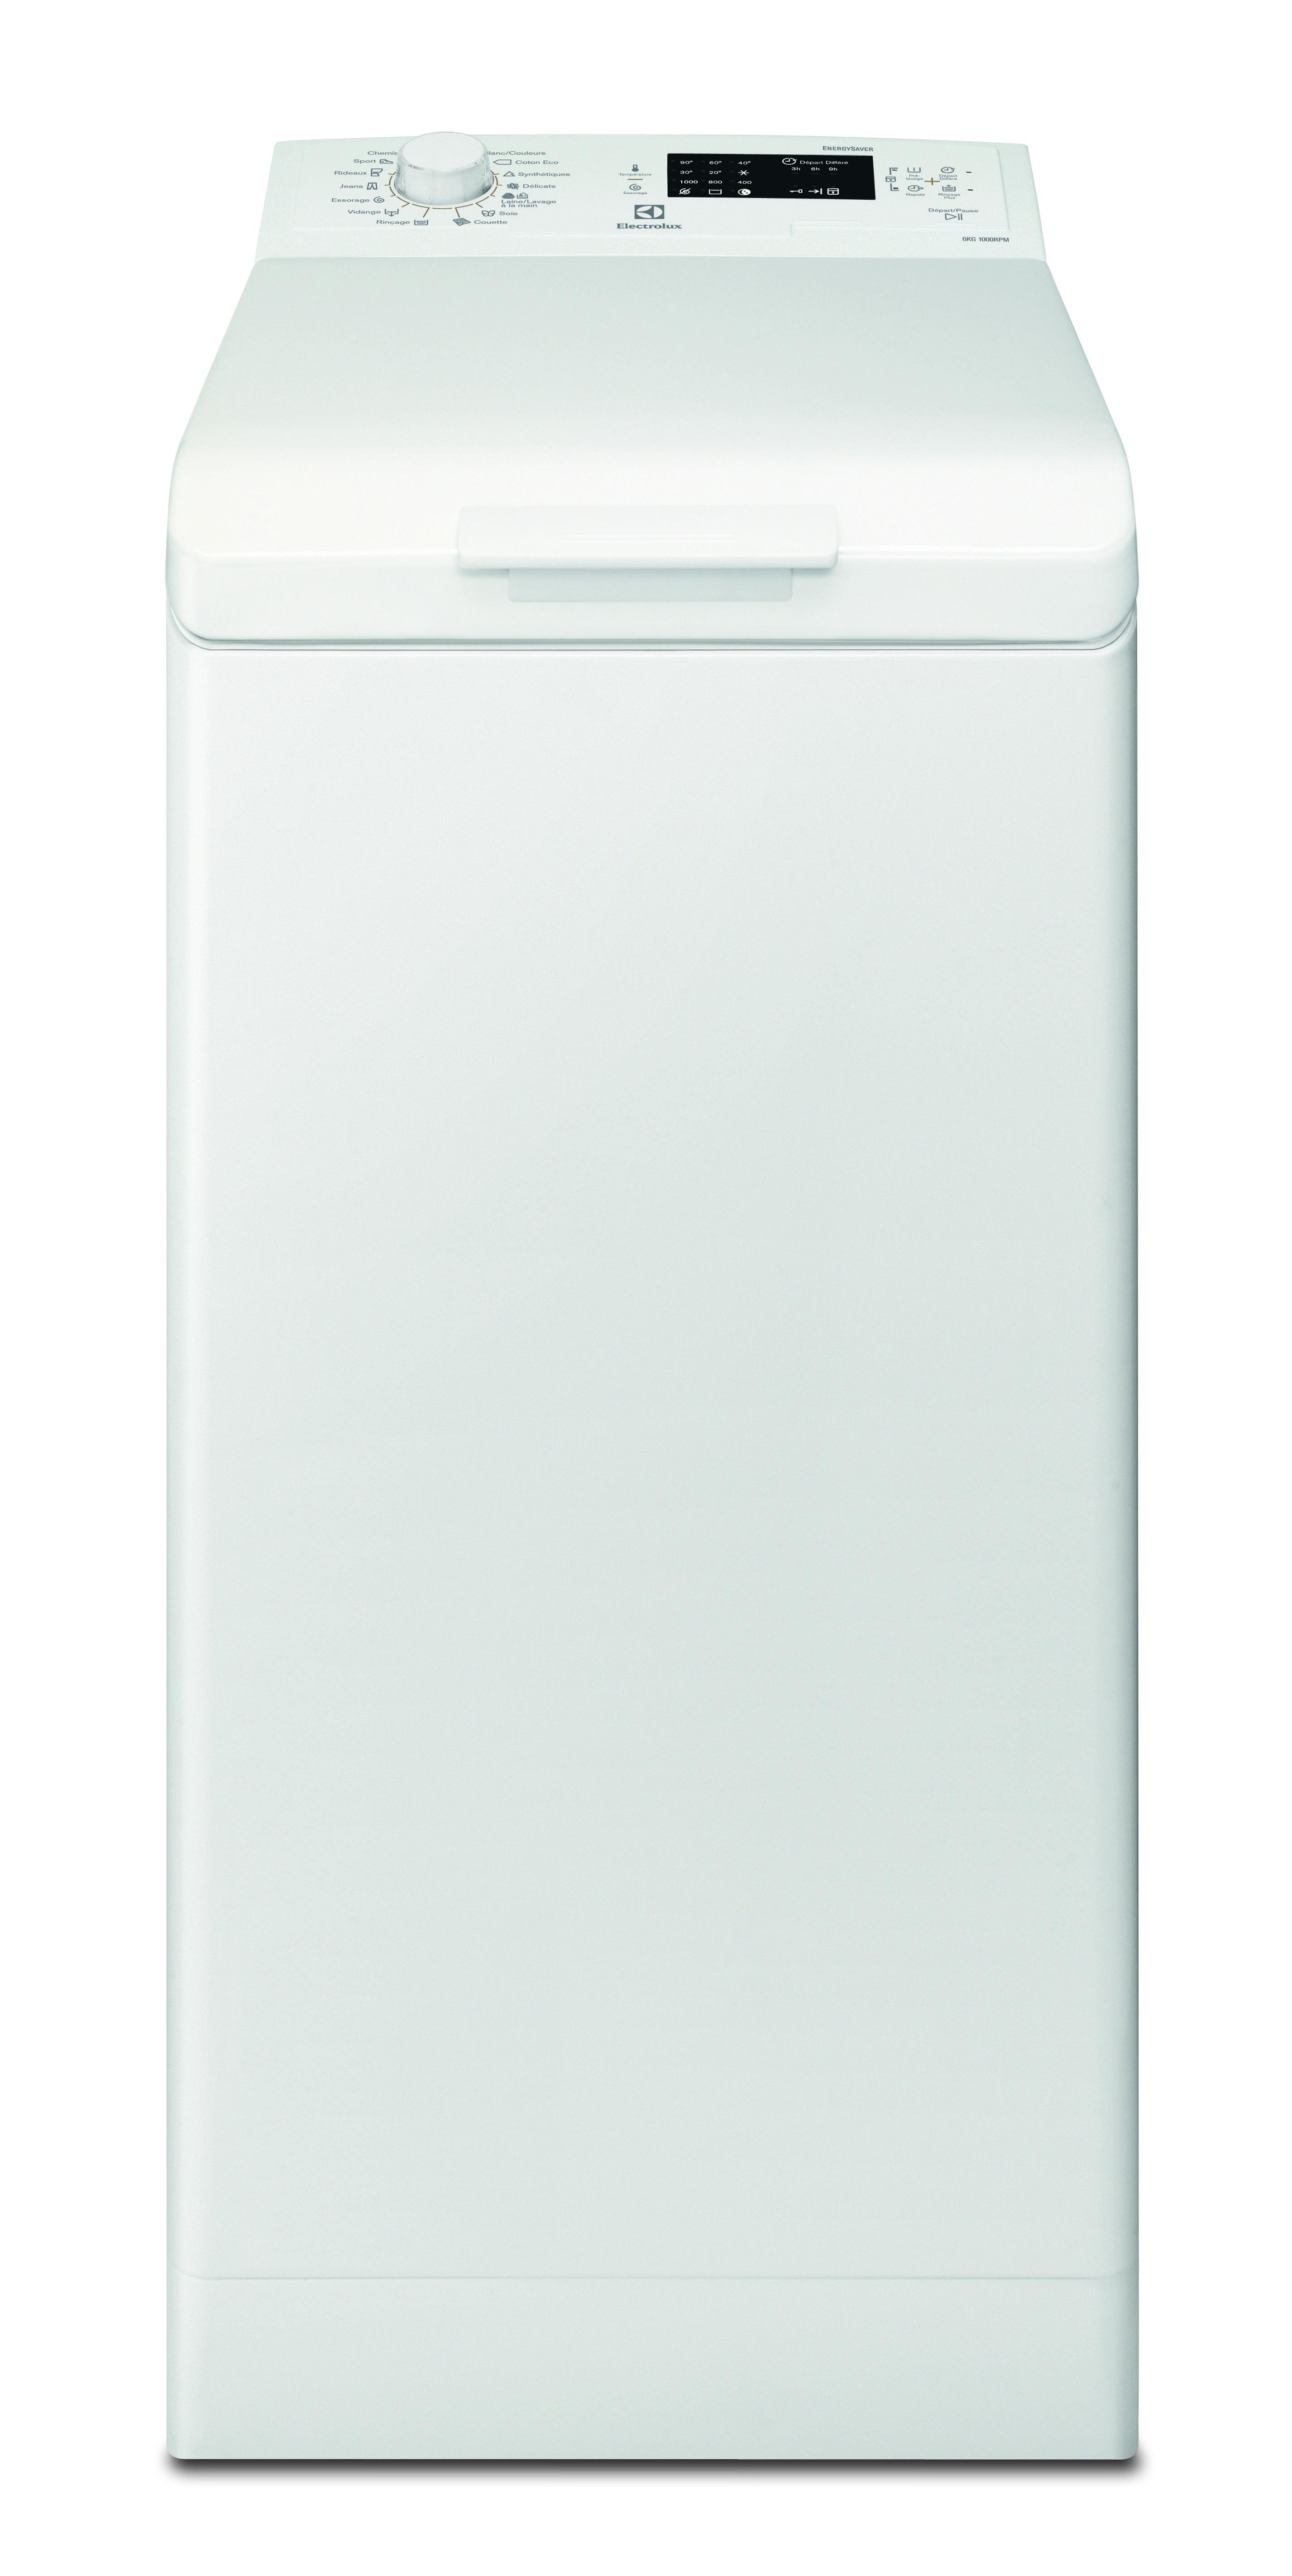 Lave-linge top Ewt1060SSW